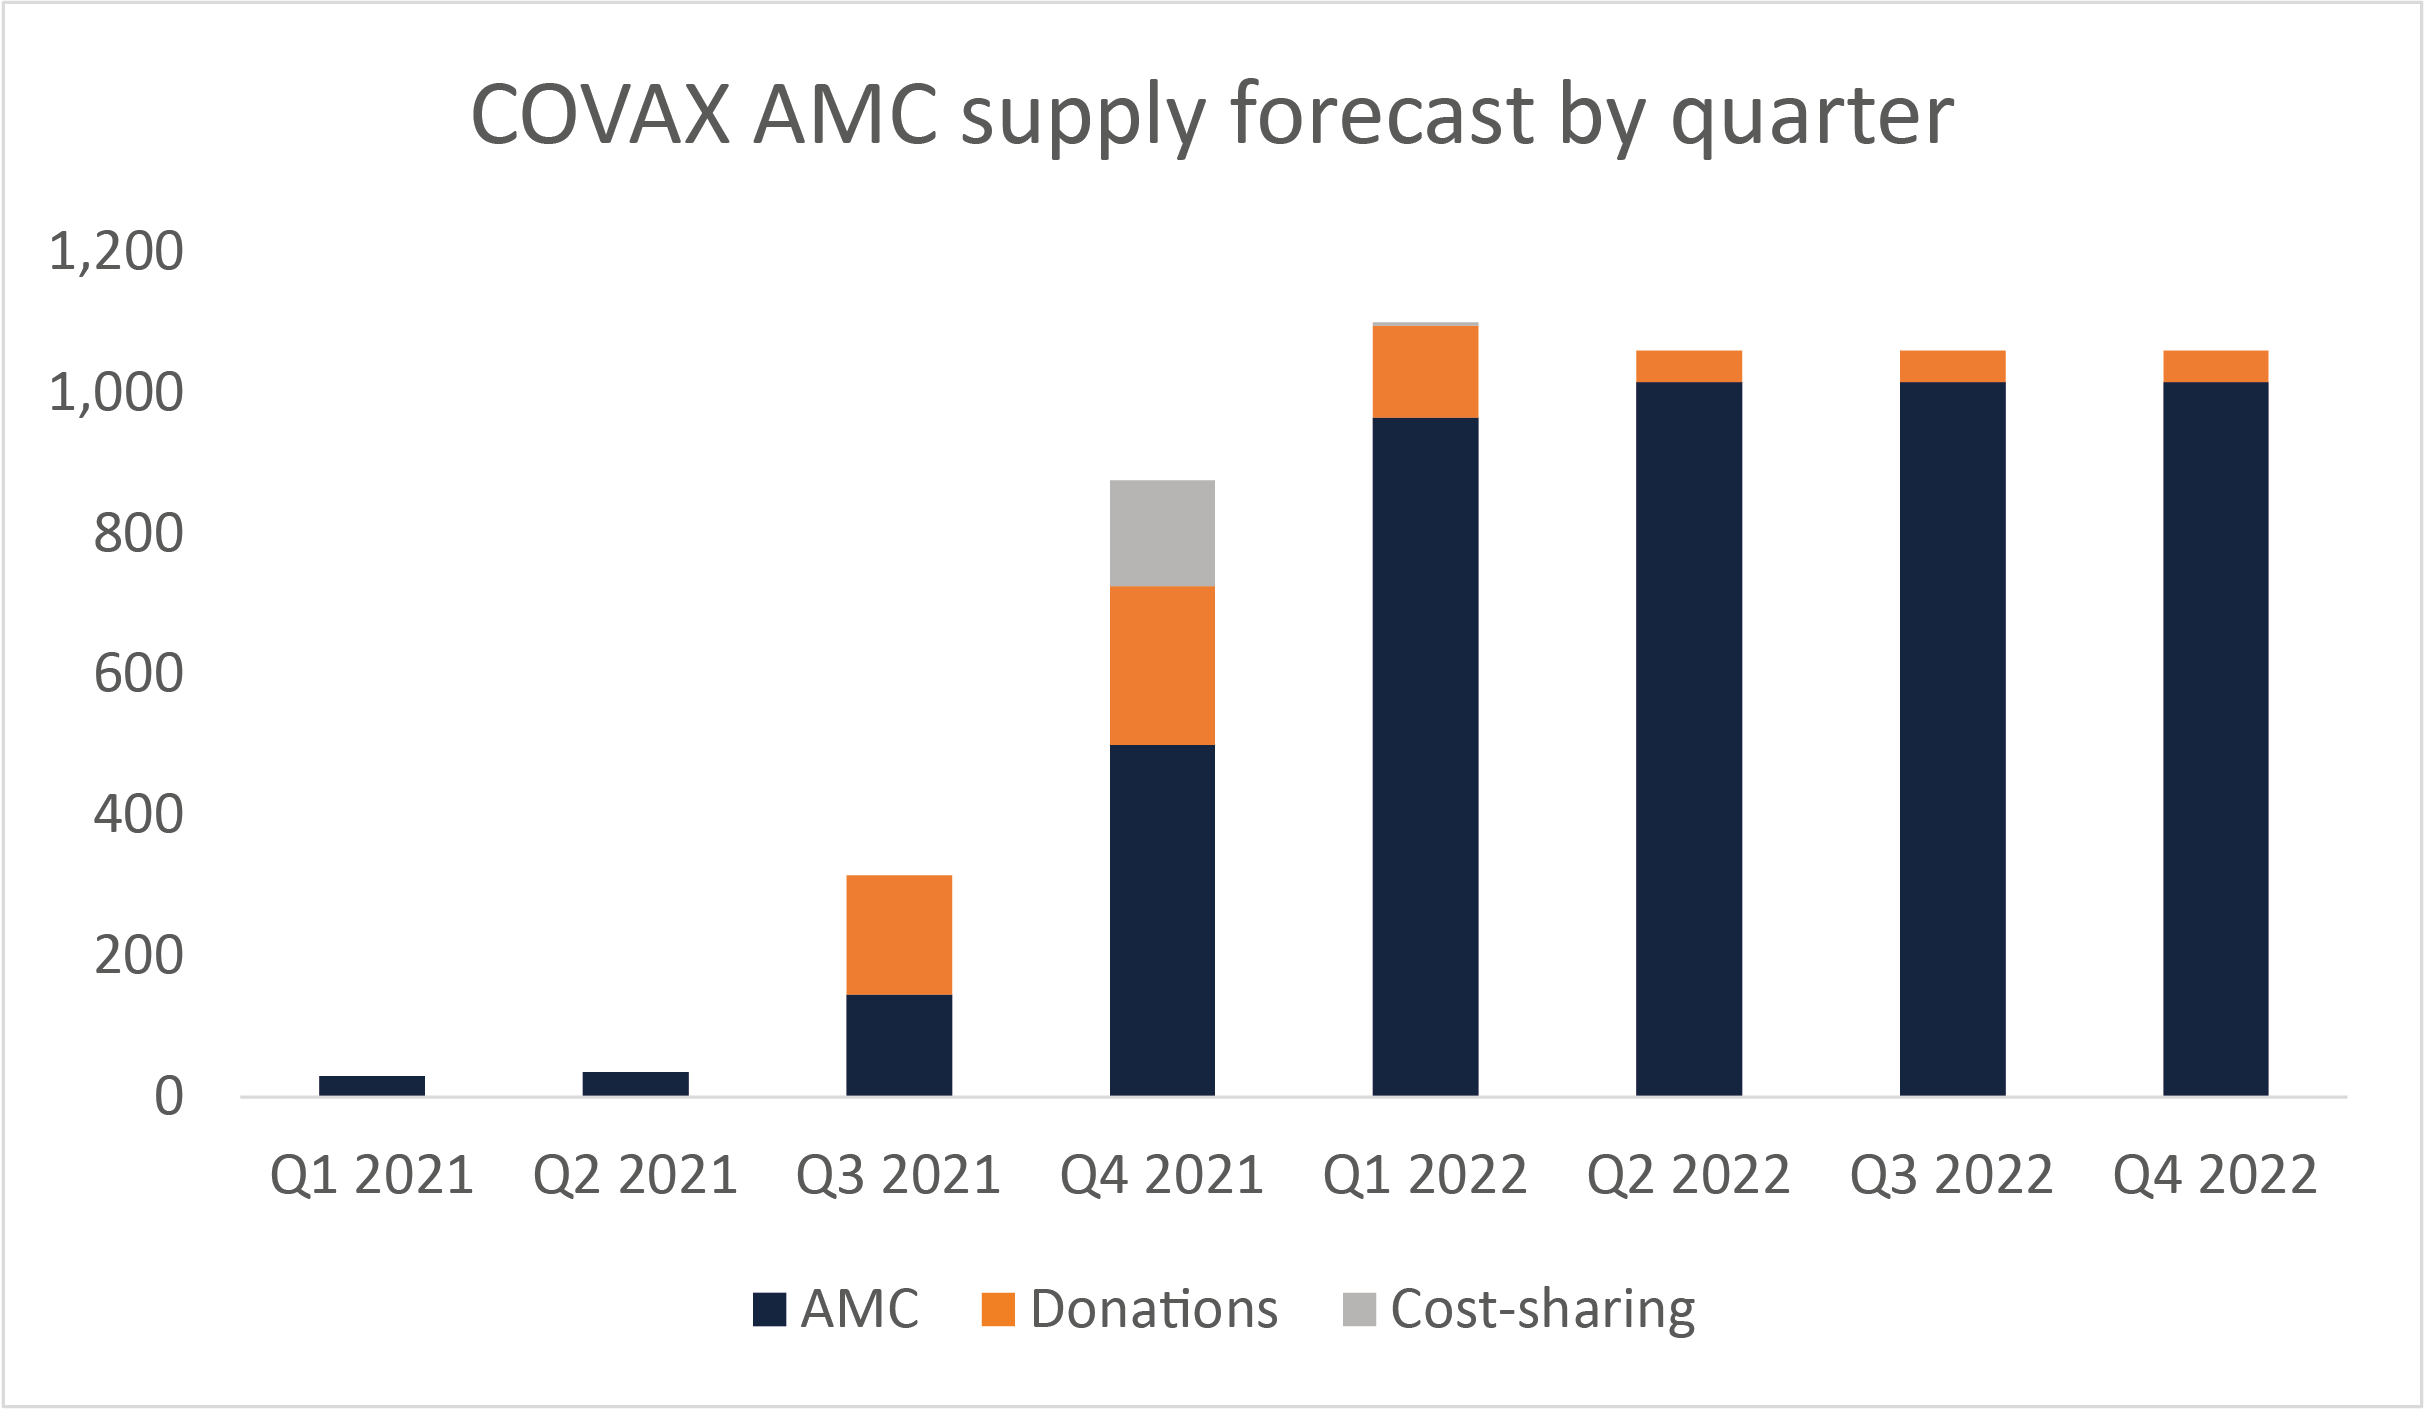 COVAX AMC supply forecast by quarter